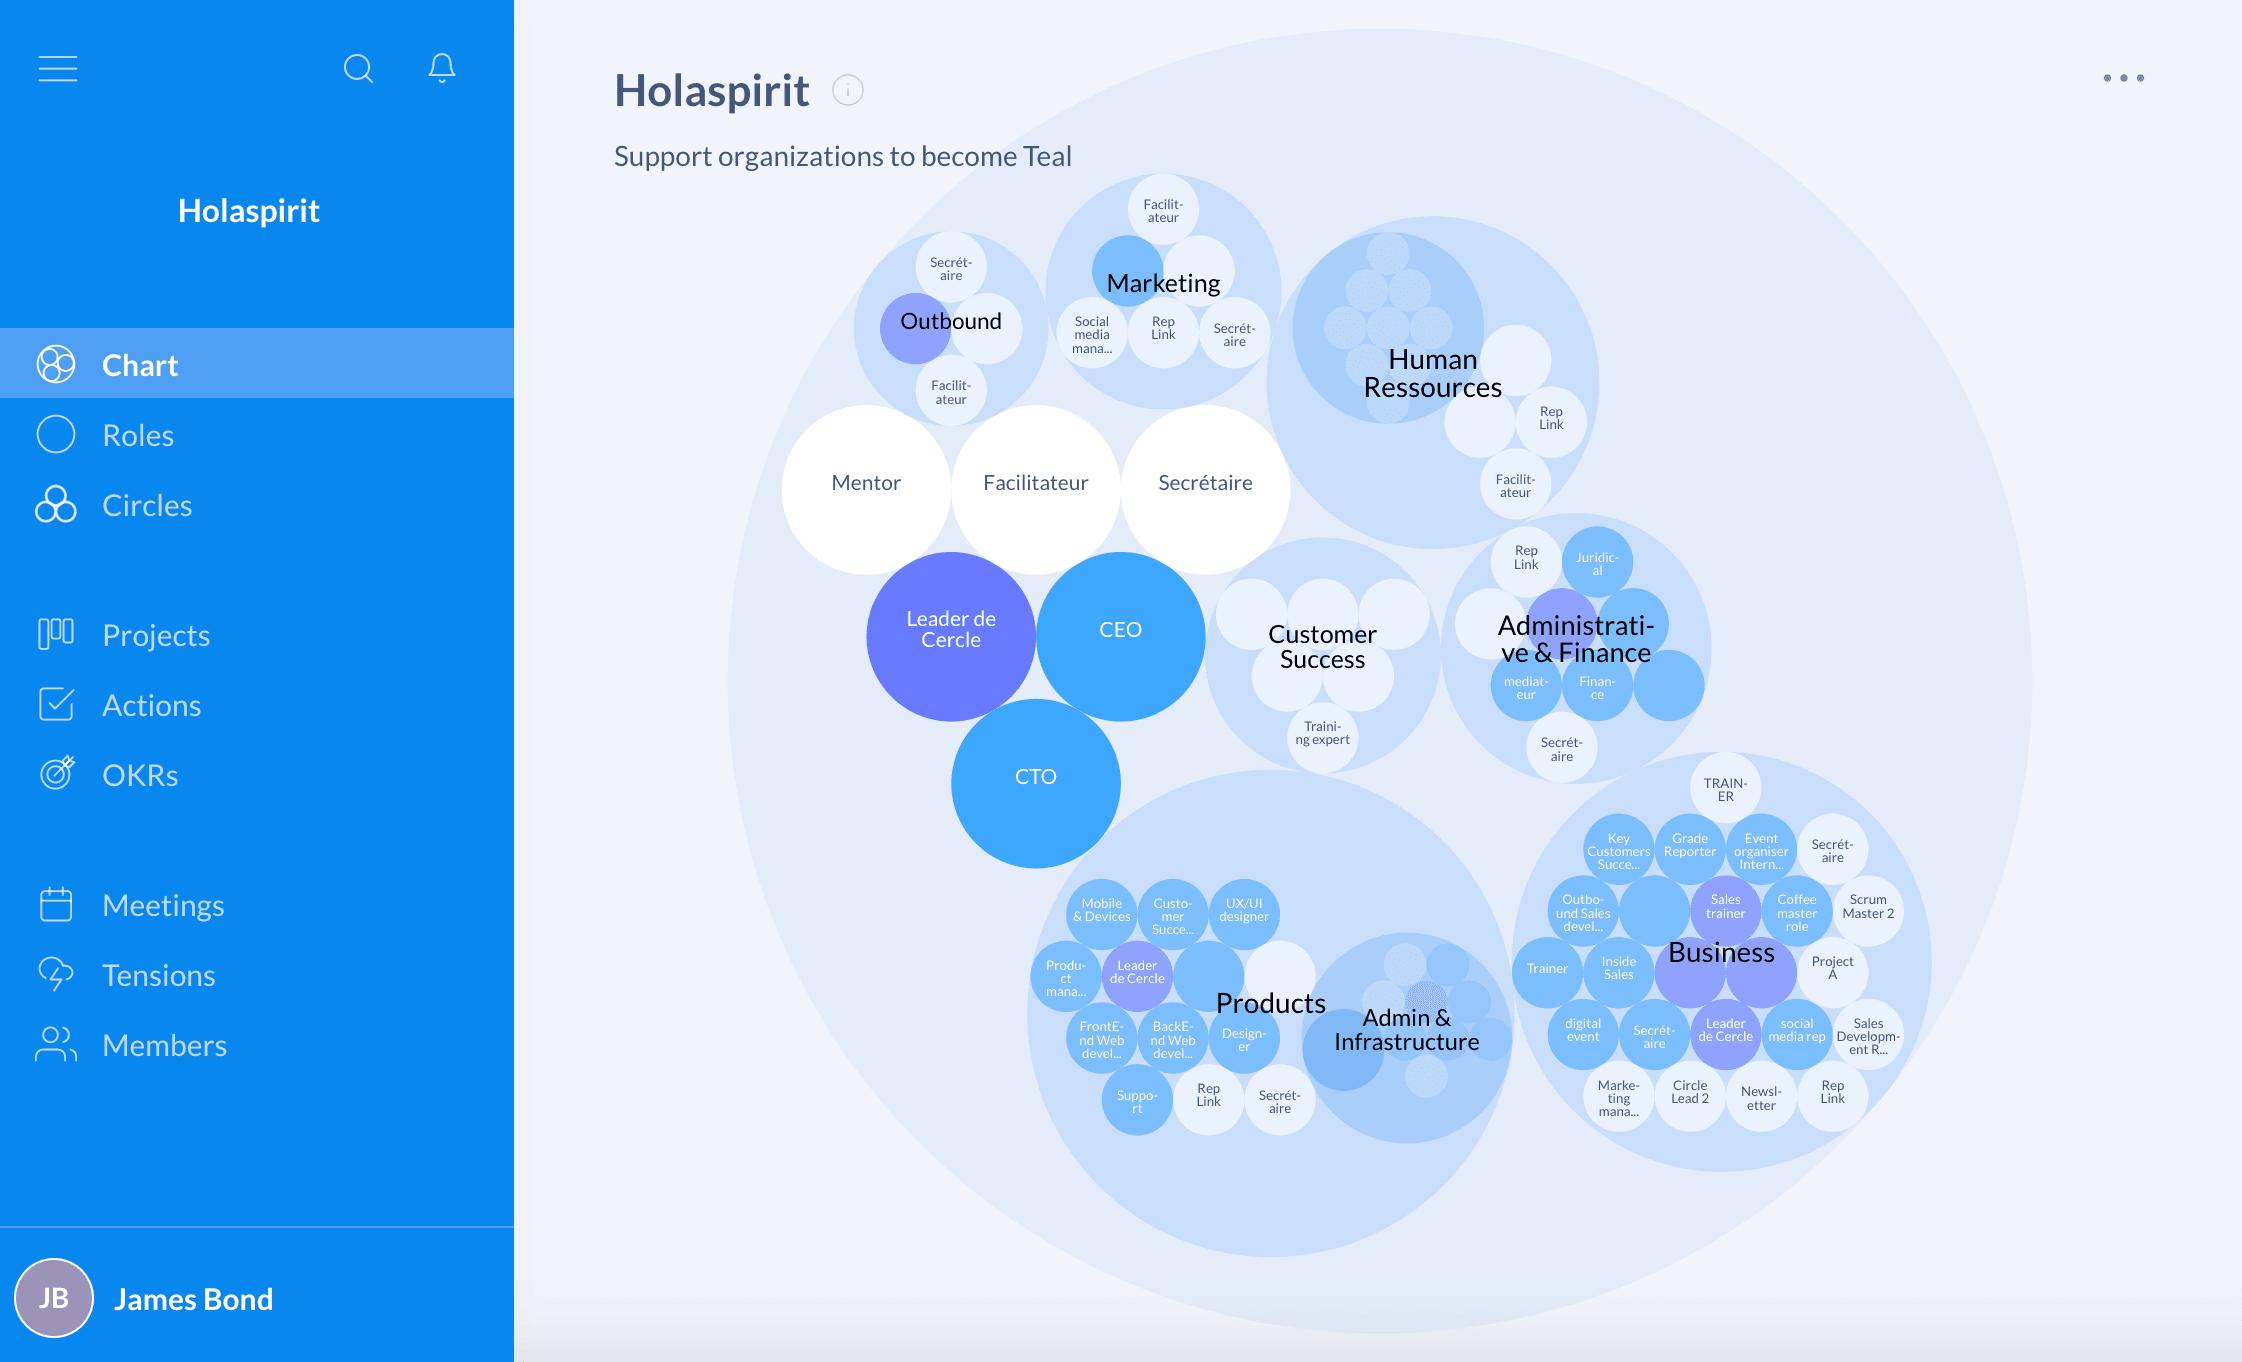 Holaspirit's org chart